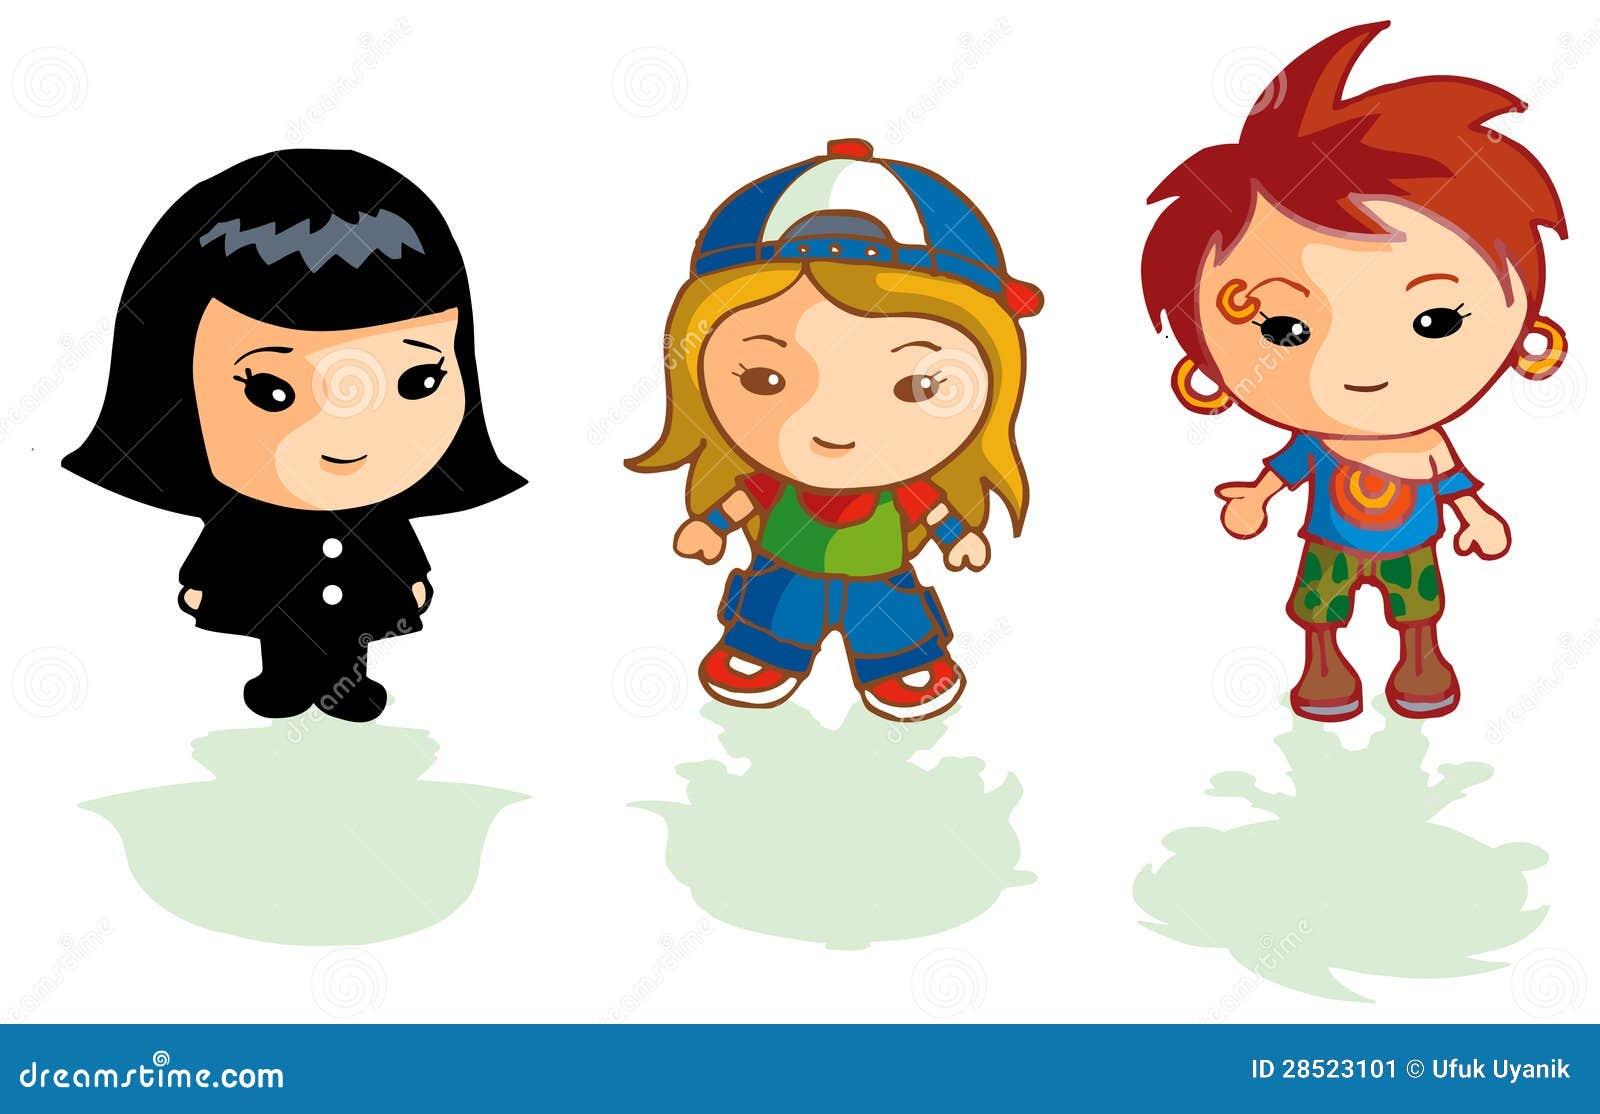 3 Girl Cartoon Characters : Different cartoon girls stock image